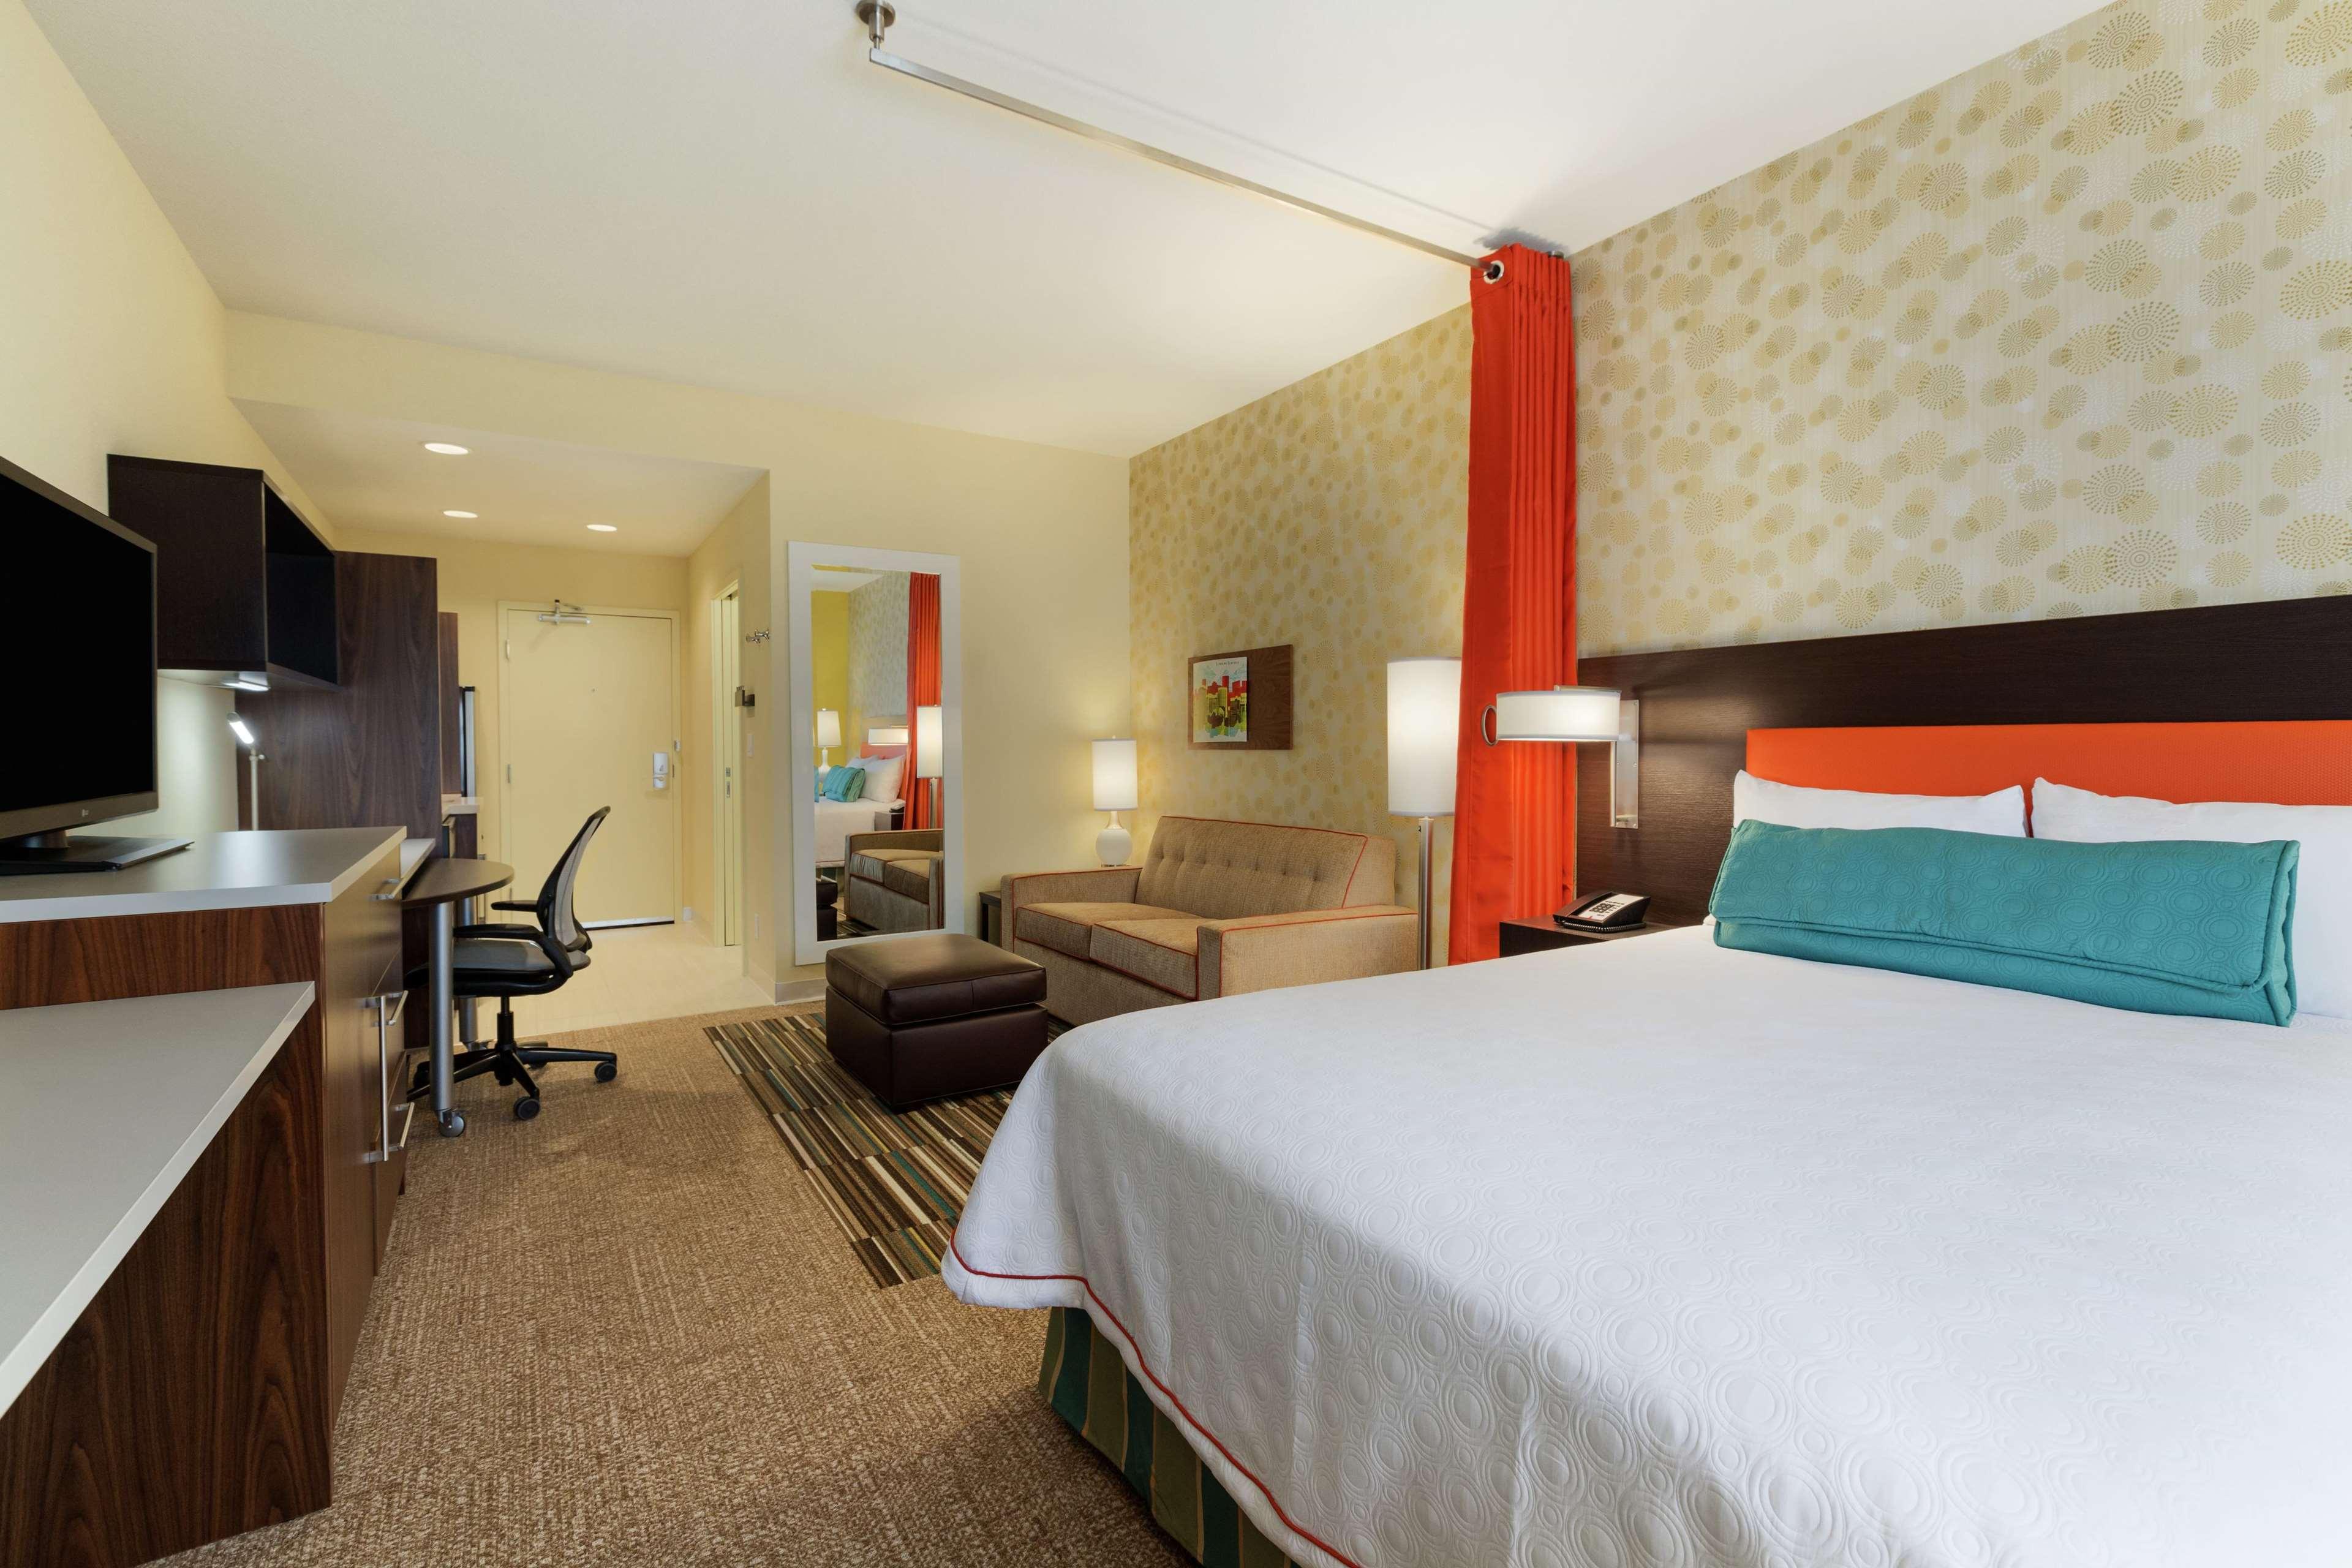 Home 2 Suites by Hilton - Yukon image 30